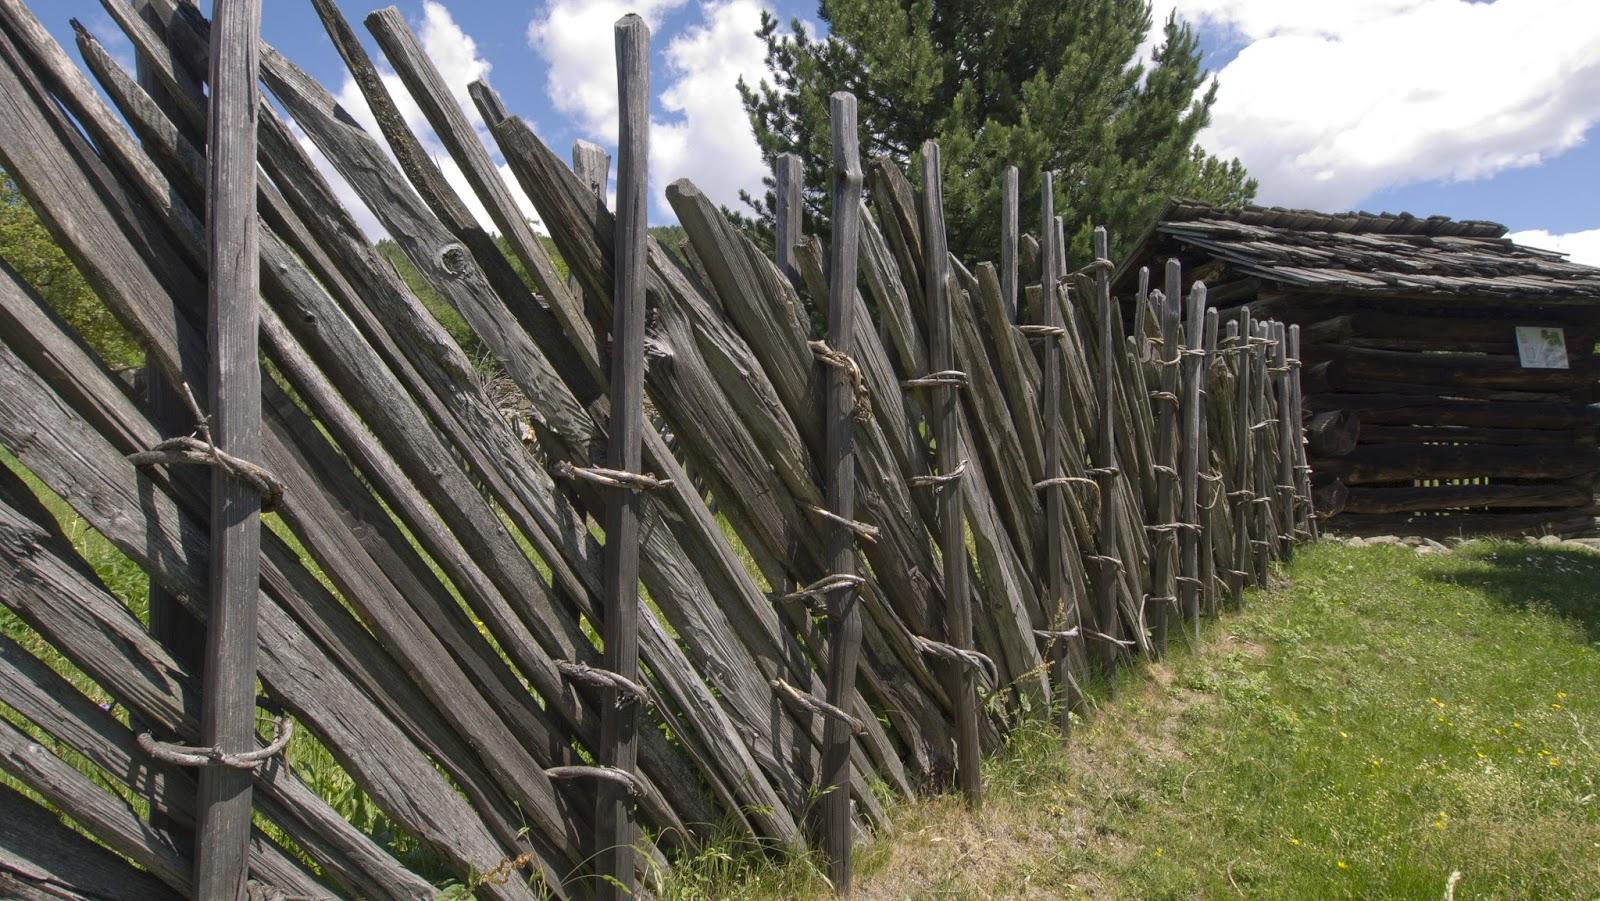 Steccato Per Giardino : Steccato per giardino staccionata in plastica per giardino idees